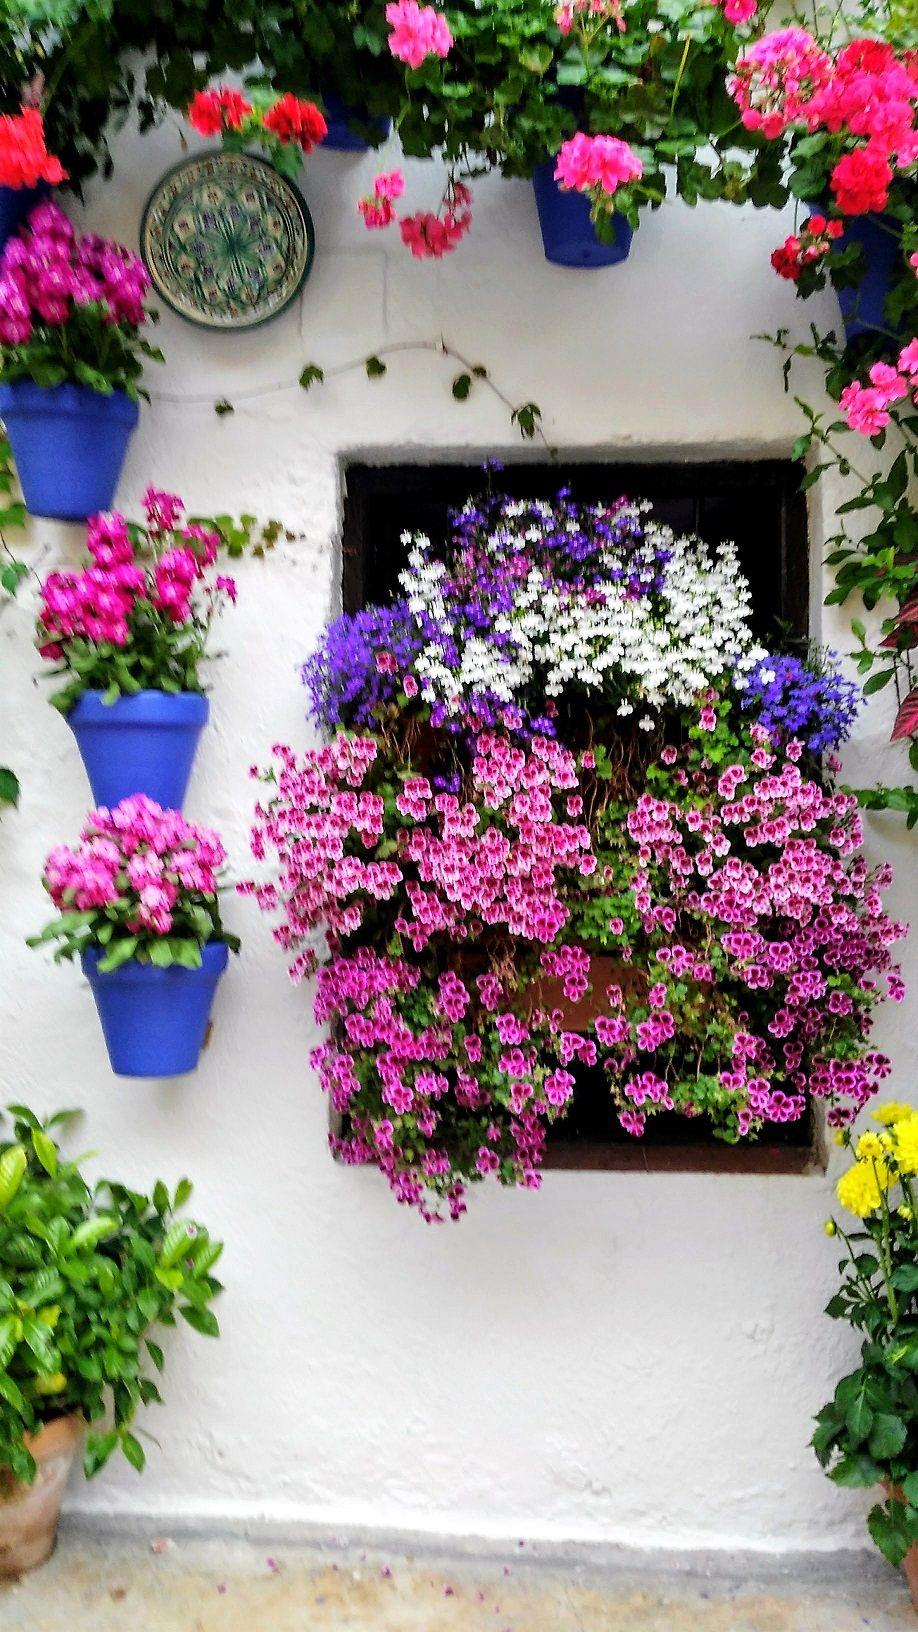 Córdoba Spain Patios Cordobeses Manualidades De Jardín Arreglos De Flores Blancas